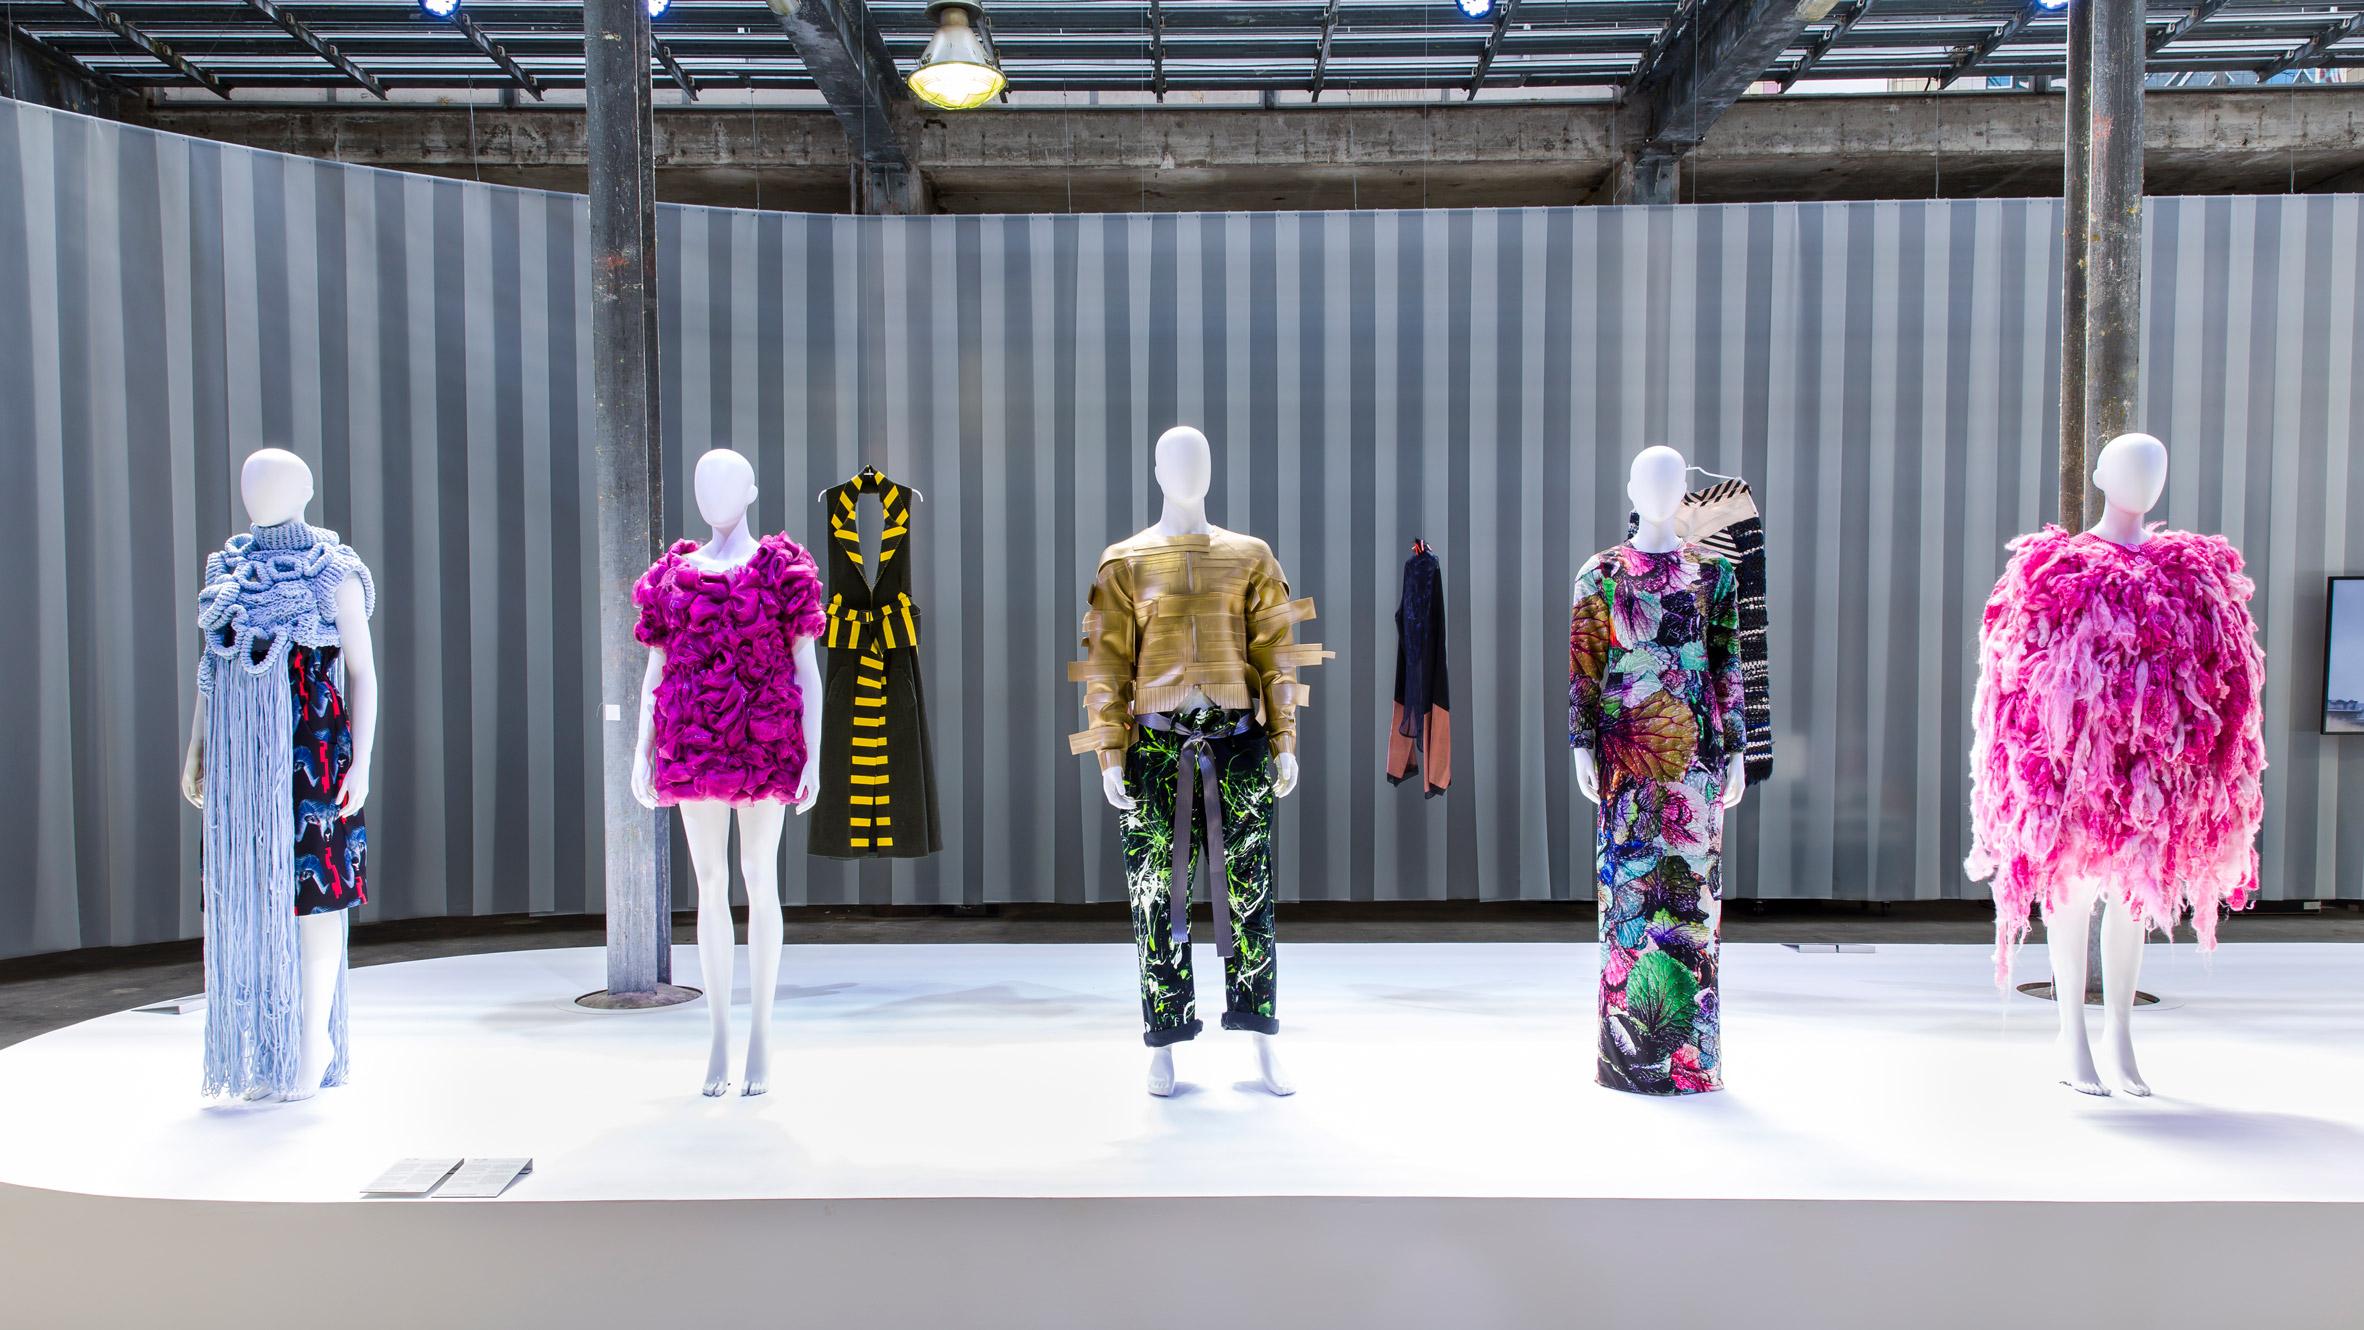 State Of Fashion Curator Jose Teunissen Promotes Sustainable Fashion